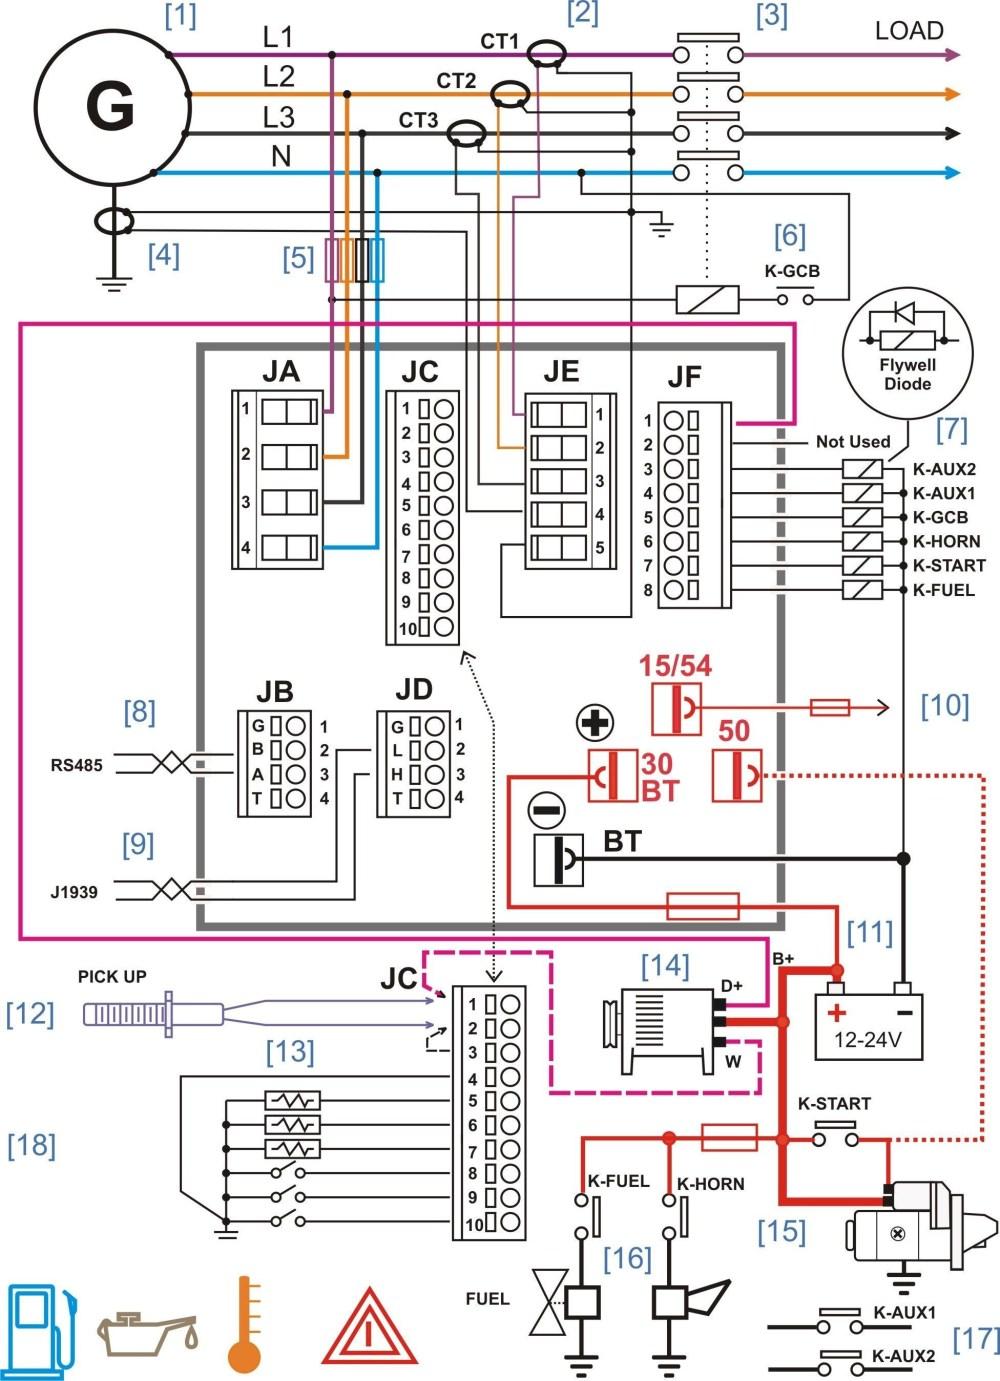 medium resolution of boat wiring diagram software circuit diagram drawing software free fresh diagram creator free best circuit